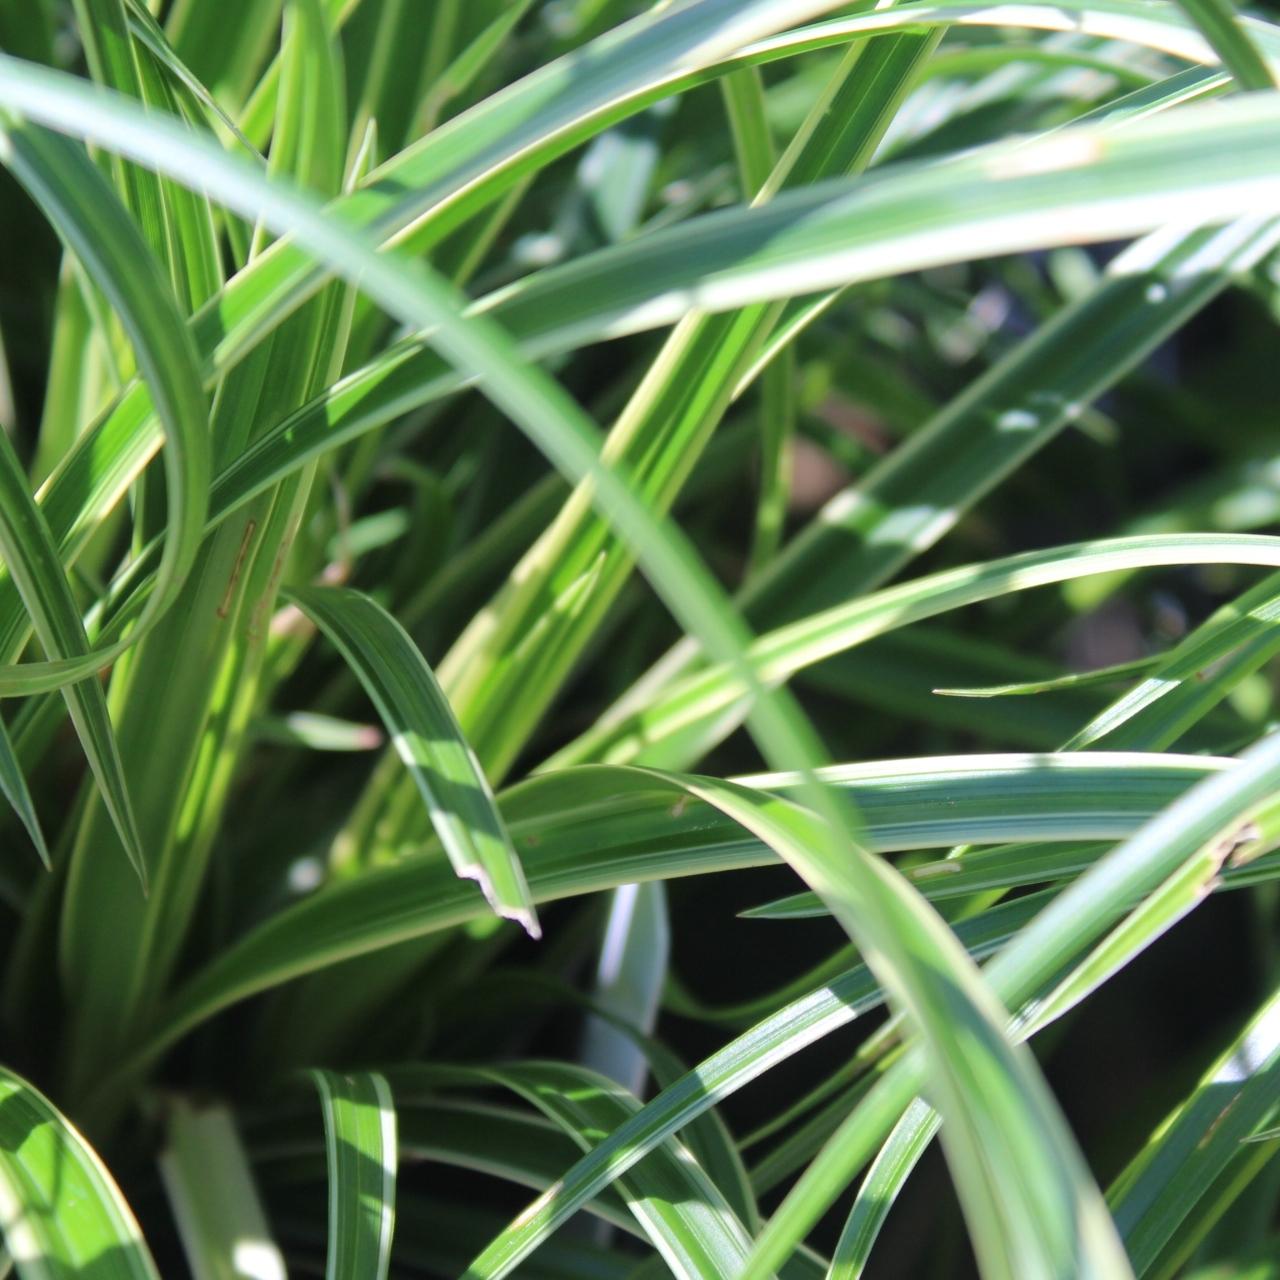 Carex 'morrowii 'Ice Dance' - Zone: 5-8Native: JapanEvergreen:Semi Foliage Color: Green and cream variegatedSpreads:RhizomesHeight: 12,